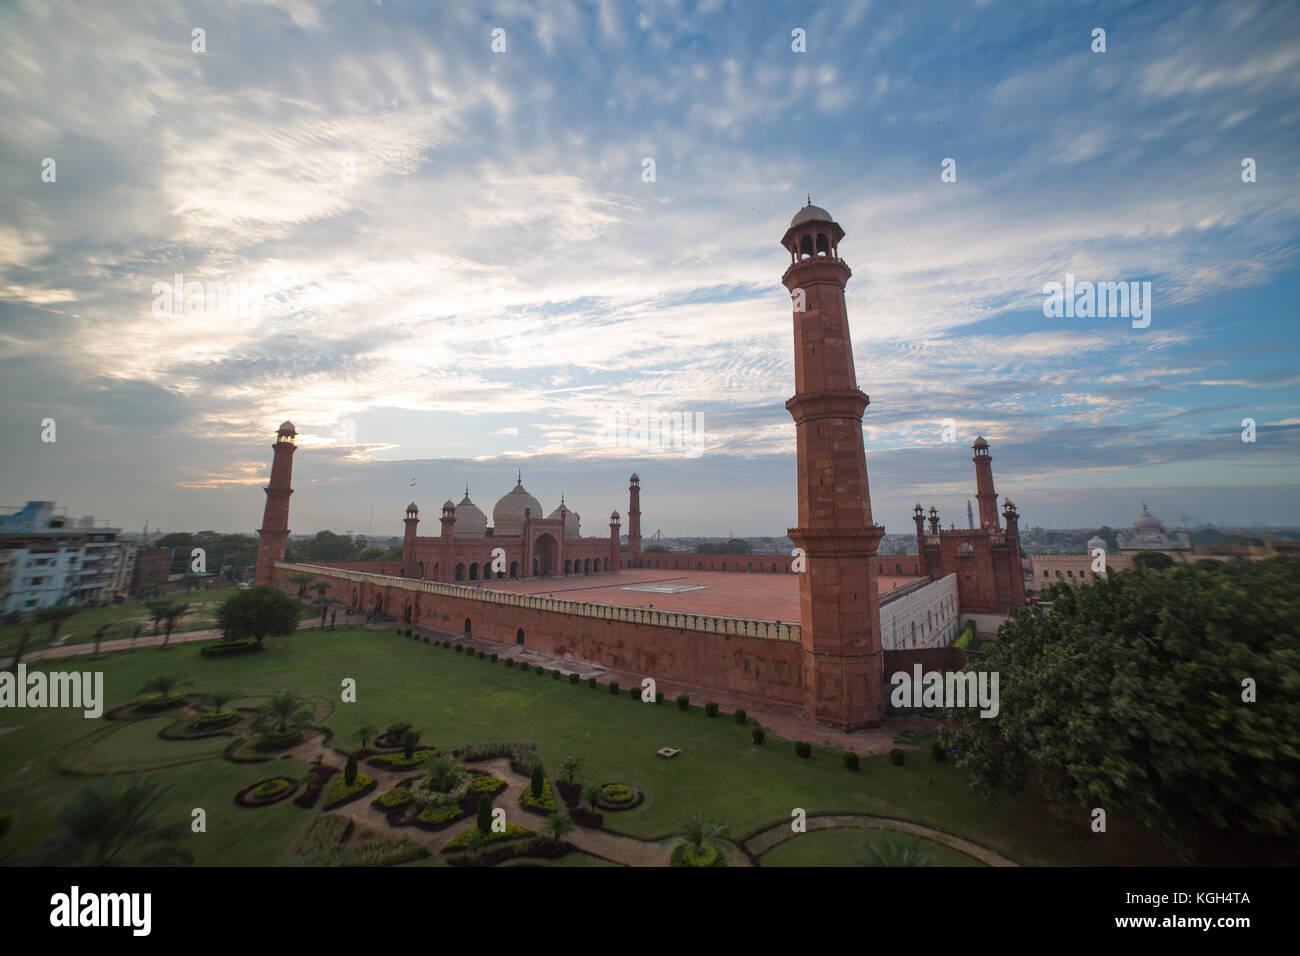 The Emperor's Mosque - Badshahi masjid wide angle full exterior - Stock Image